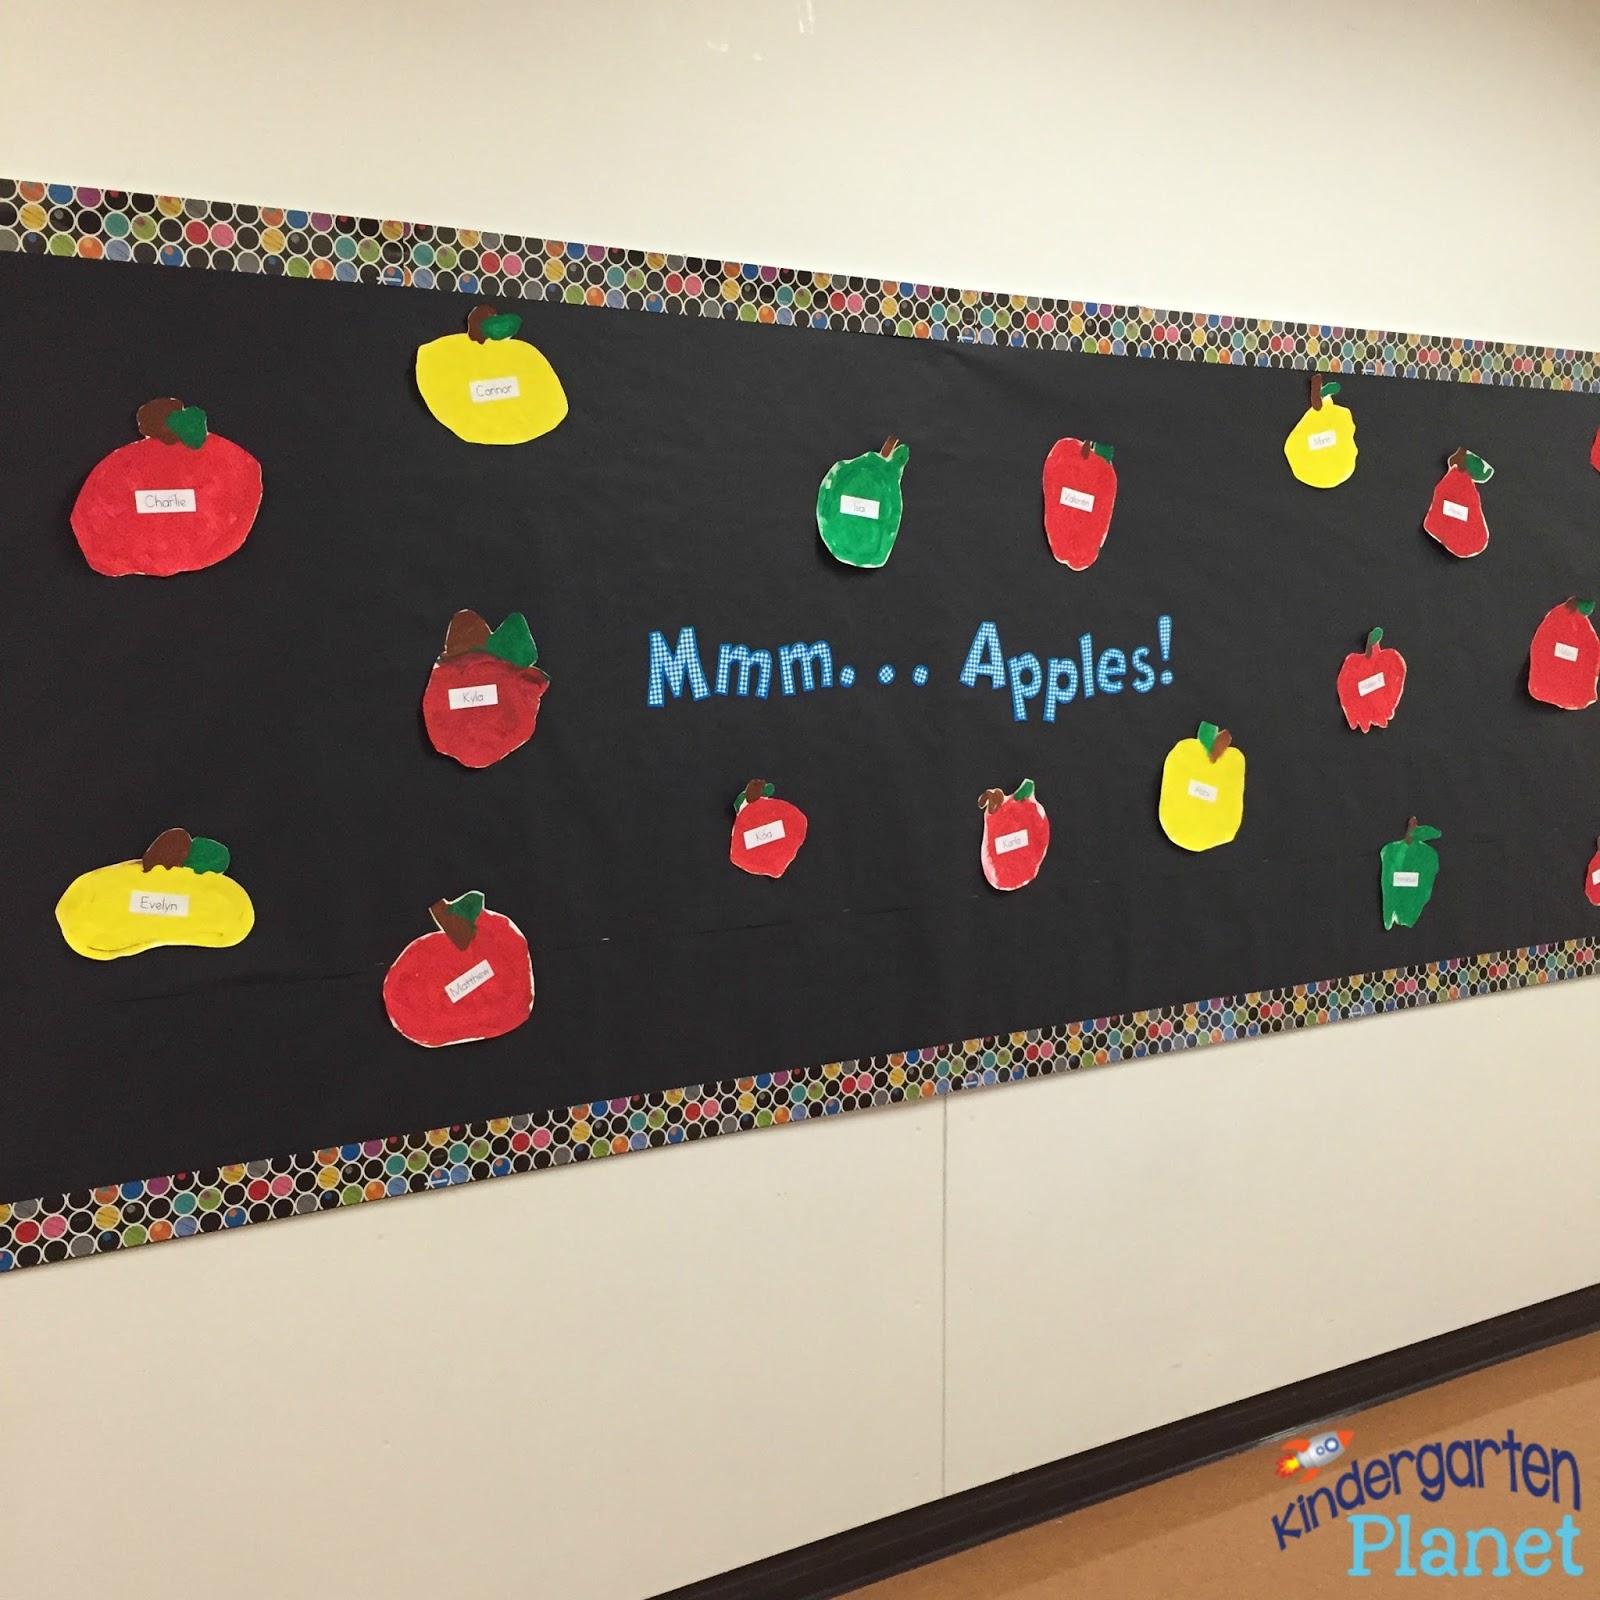 Apple Cores Are A Myth: Kindergarten Planet: Back To School In Kindergarten